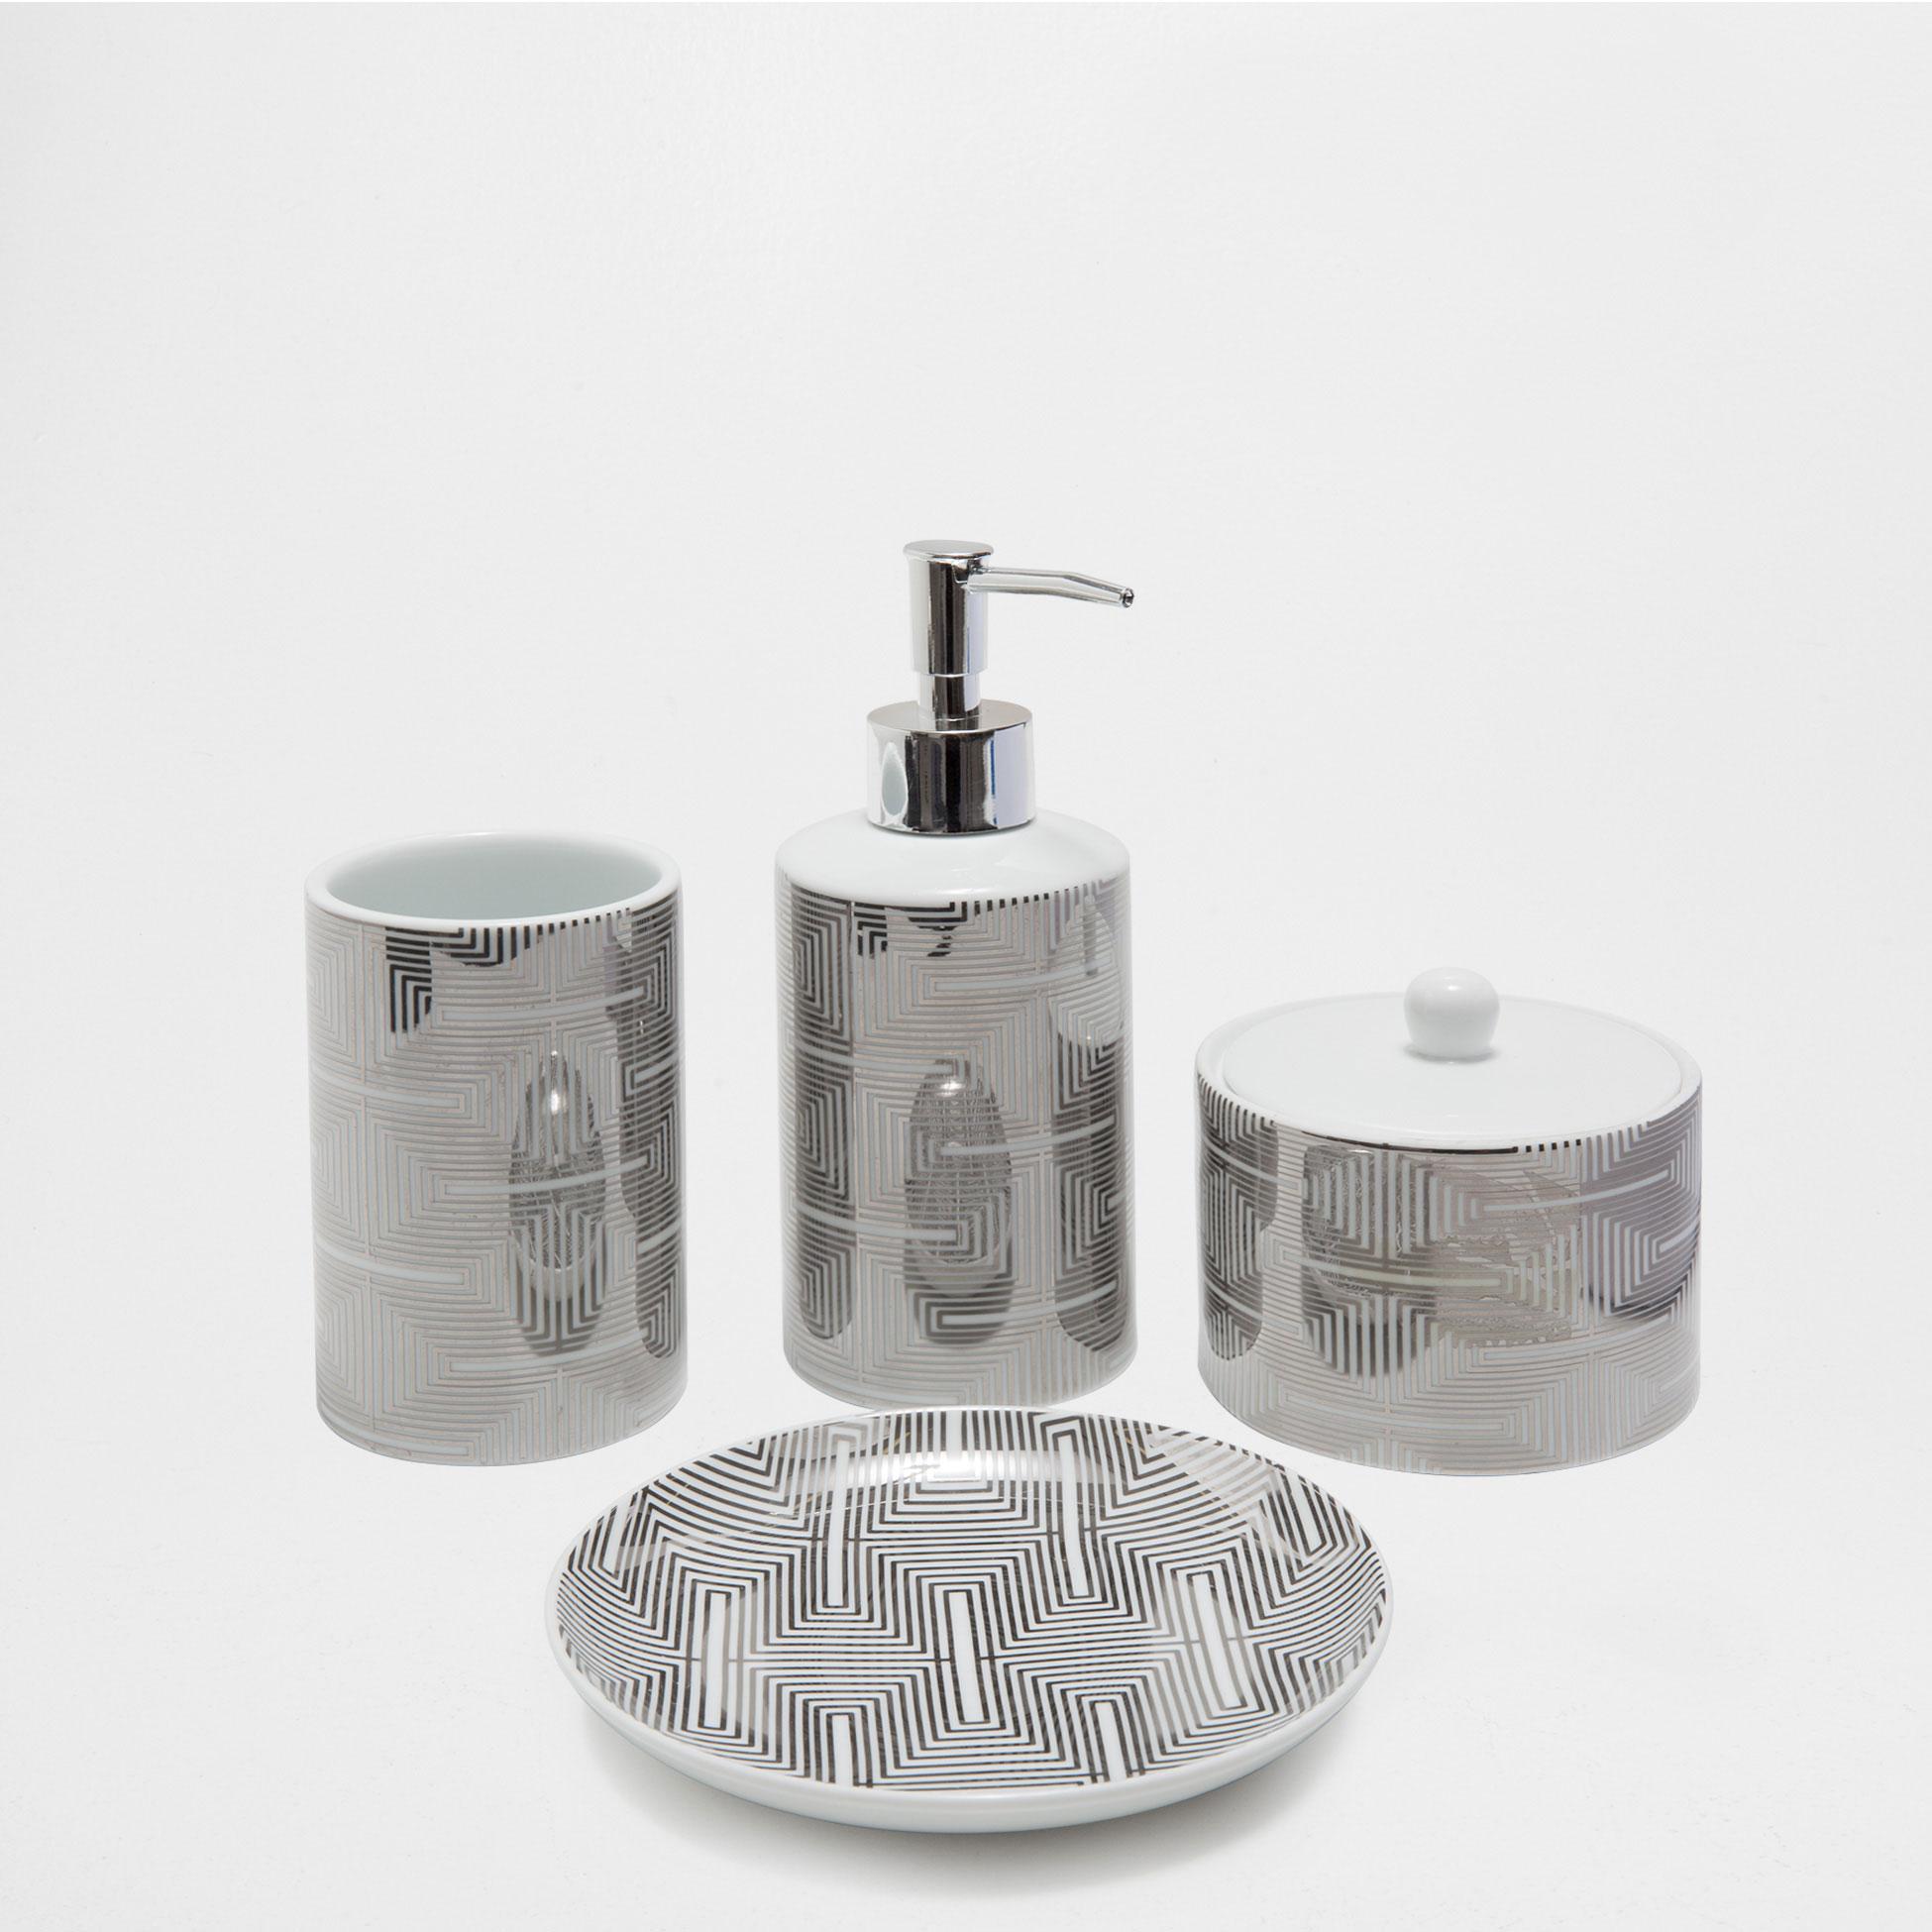 Geometric bathroom set from Zara Home